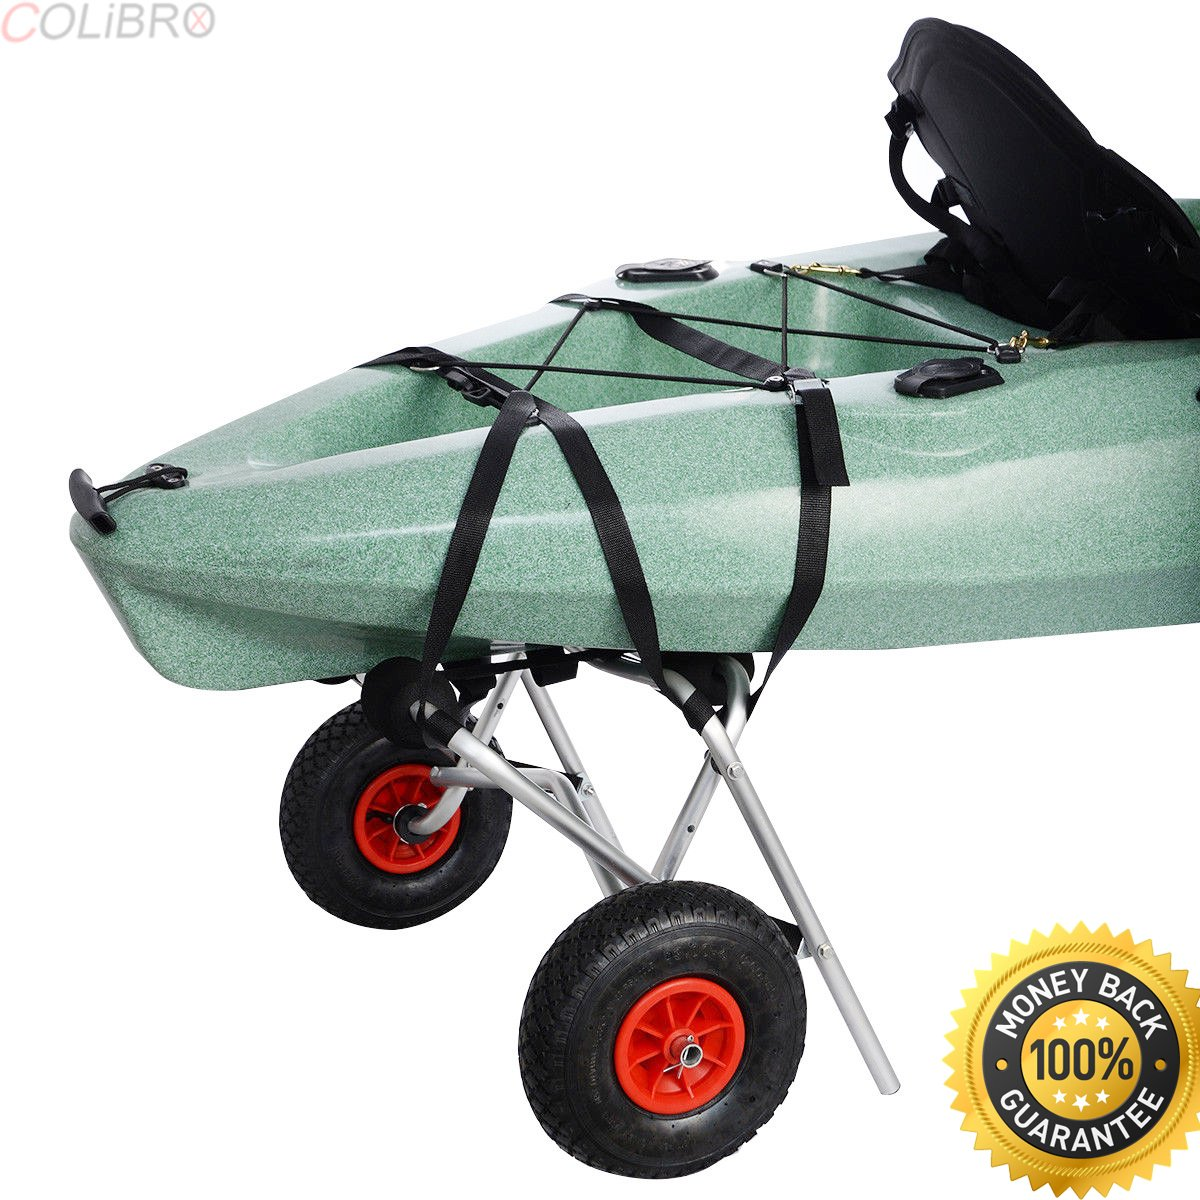 COLIBROX--New Aluminum Kayak Jon Boat Canoe Gear Dolly Cart Trailer Carrier Trolley Wheels. Solid aluminum frame. Large Load capacity. best Gear Dolly Cart sale on amazon. bass pro deer cart